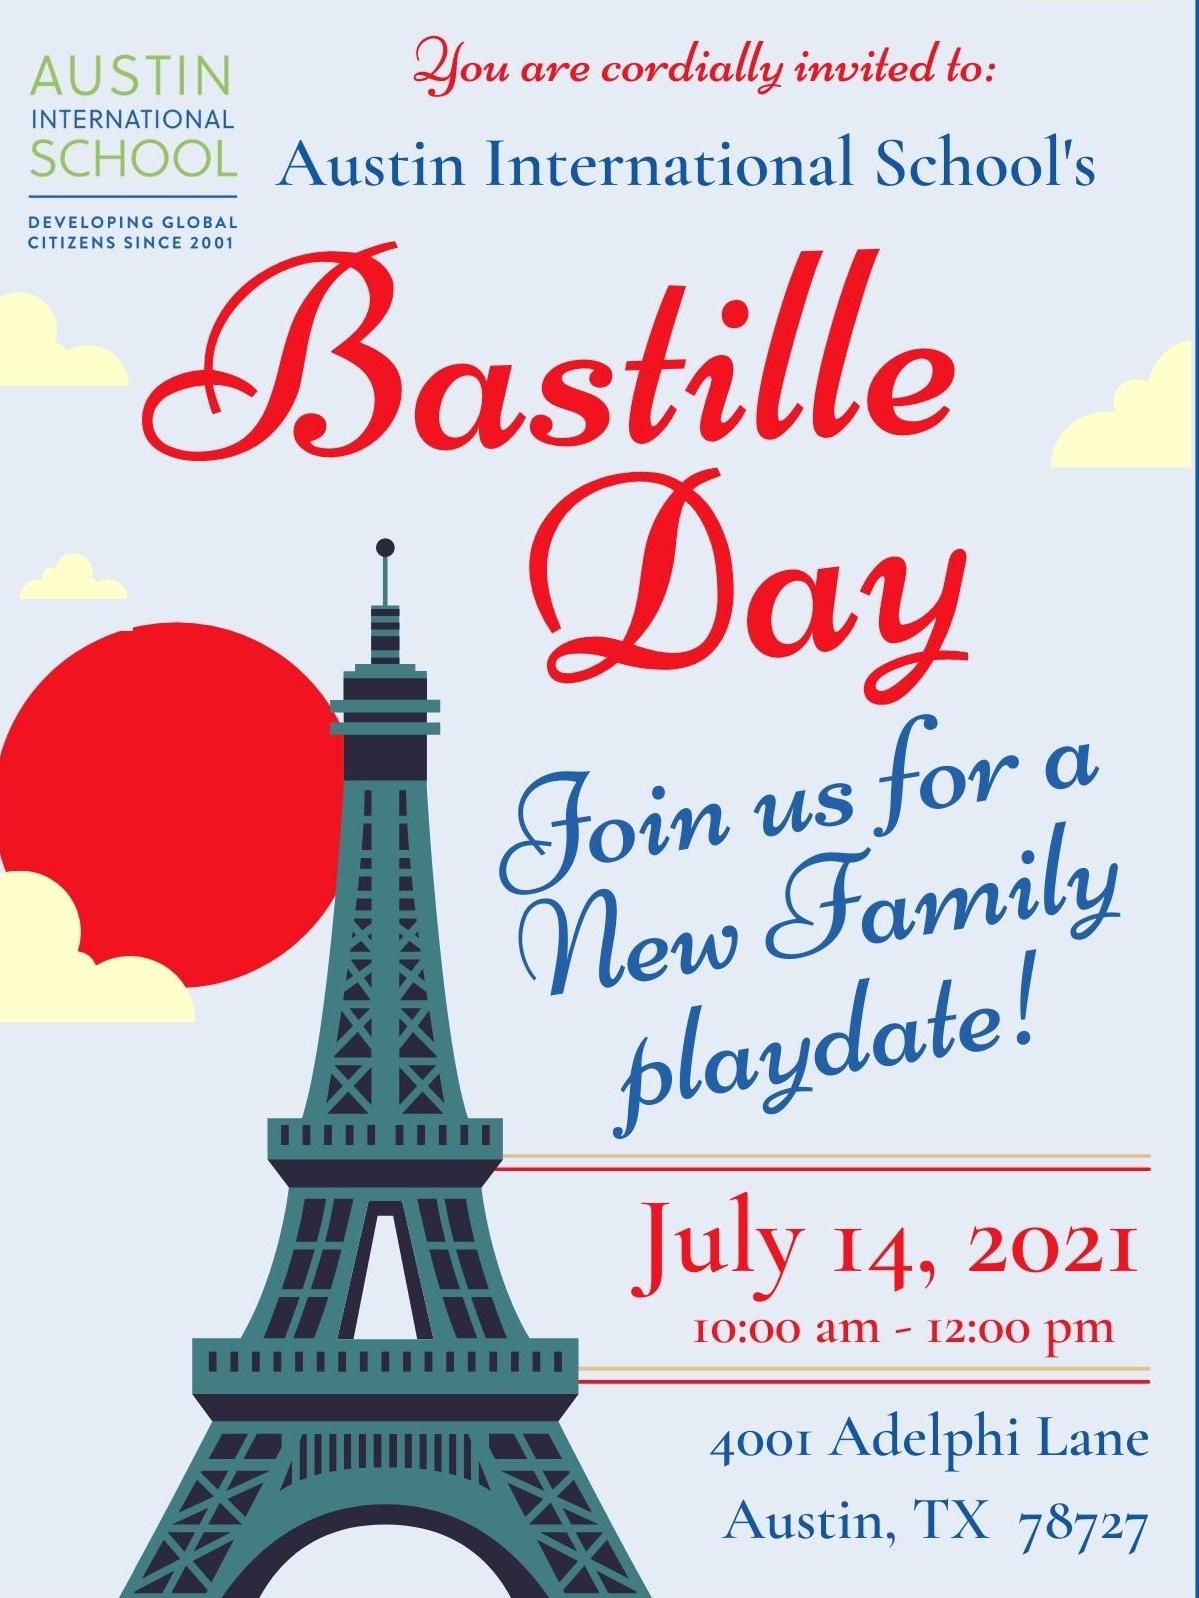 Bastille Day New Family Playdate